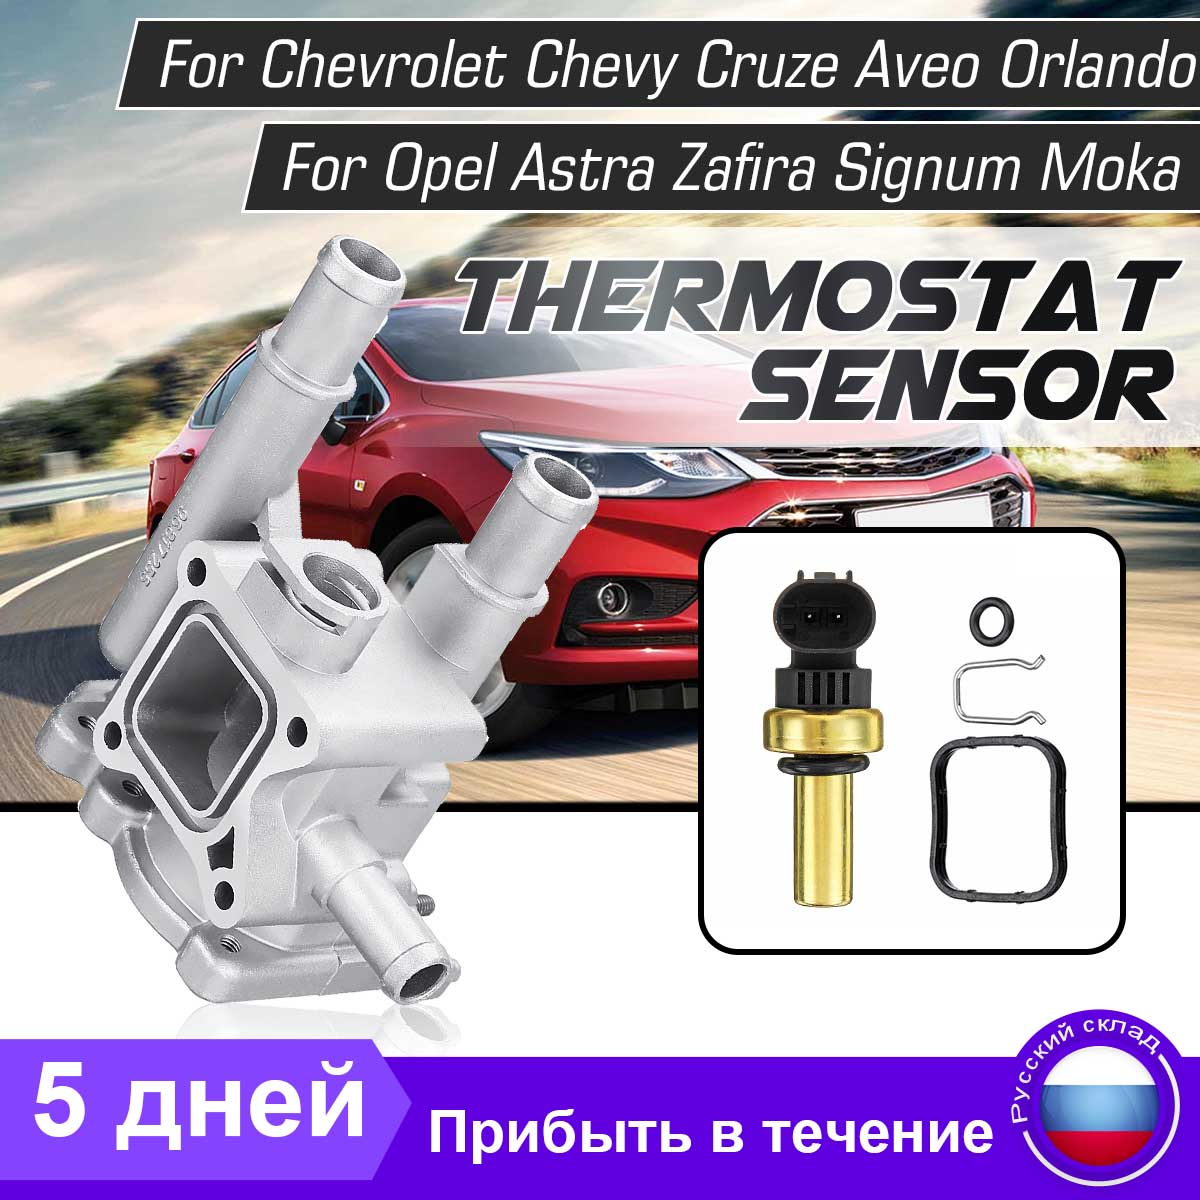 Aluminum Thermostat Housing Cover 96984103 96817255 For Chevrolet Chevy For Cruze Aveo Orlando For Opel Astra Zafira Signum Moka